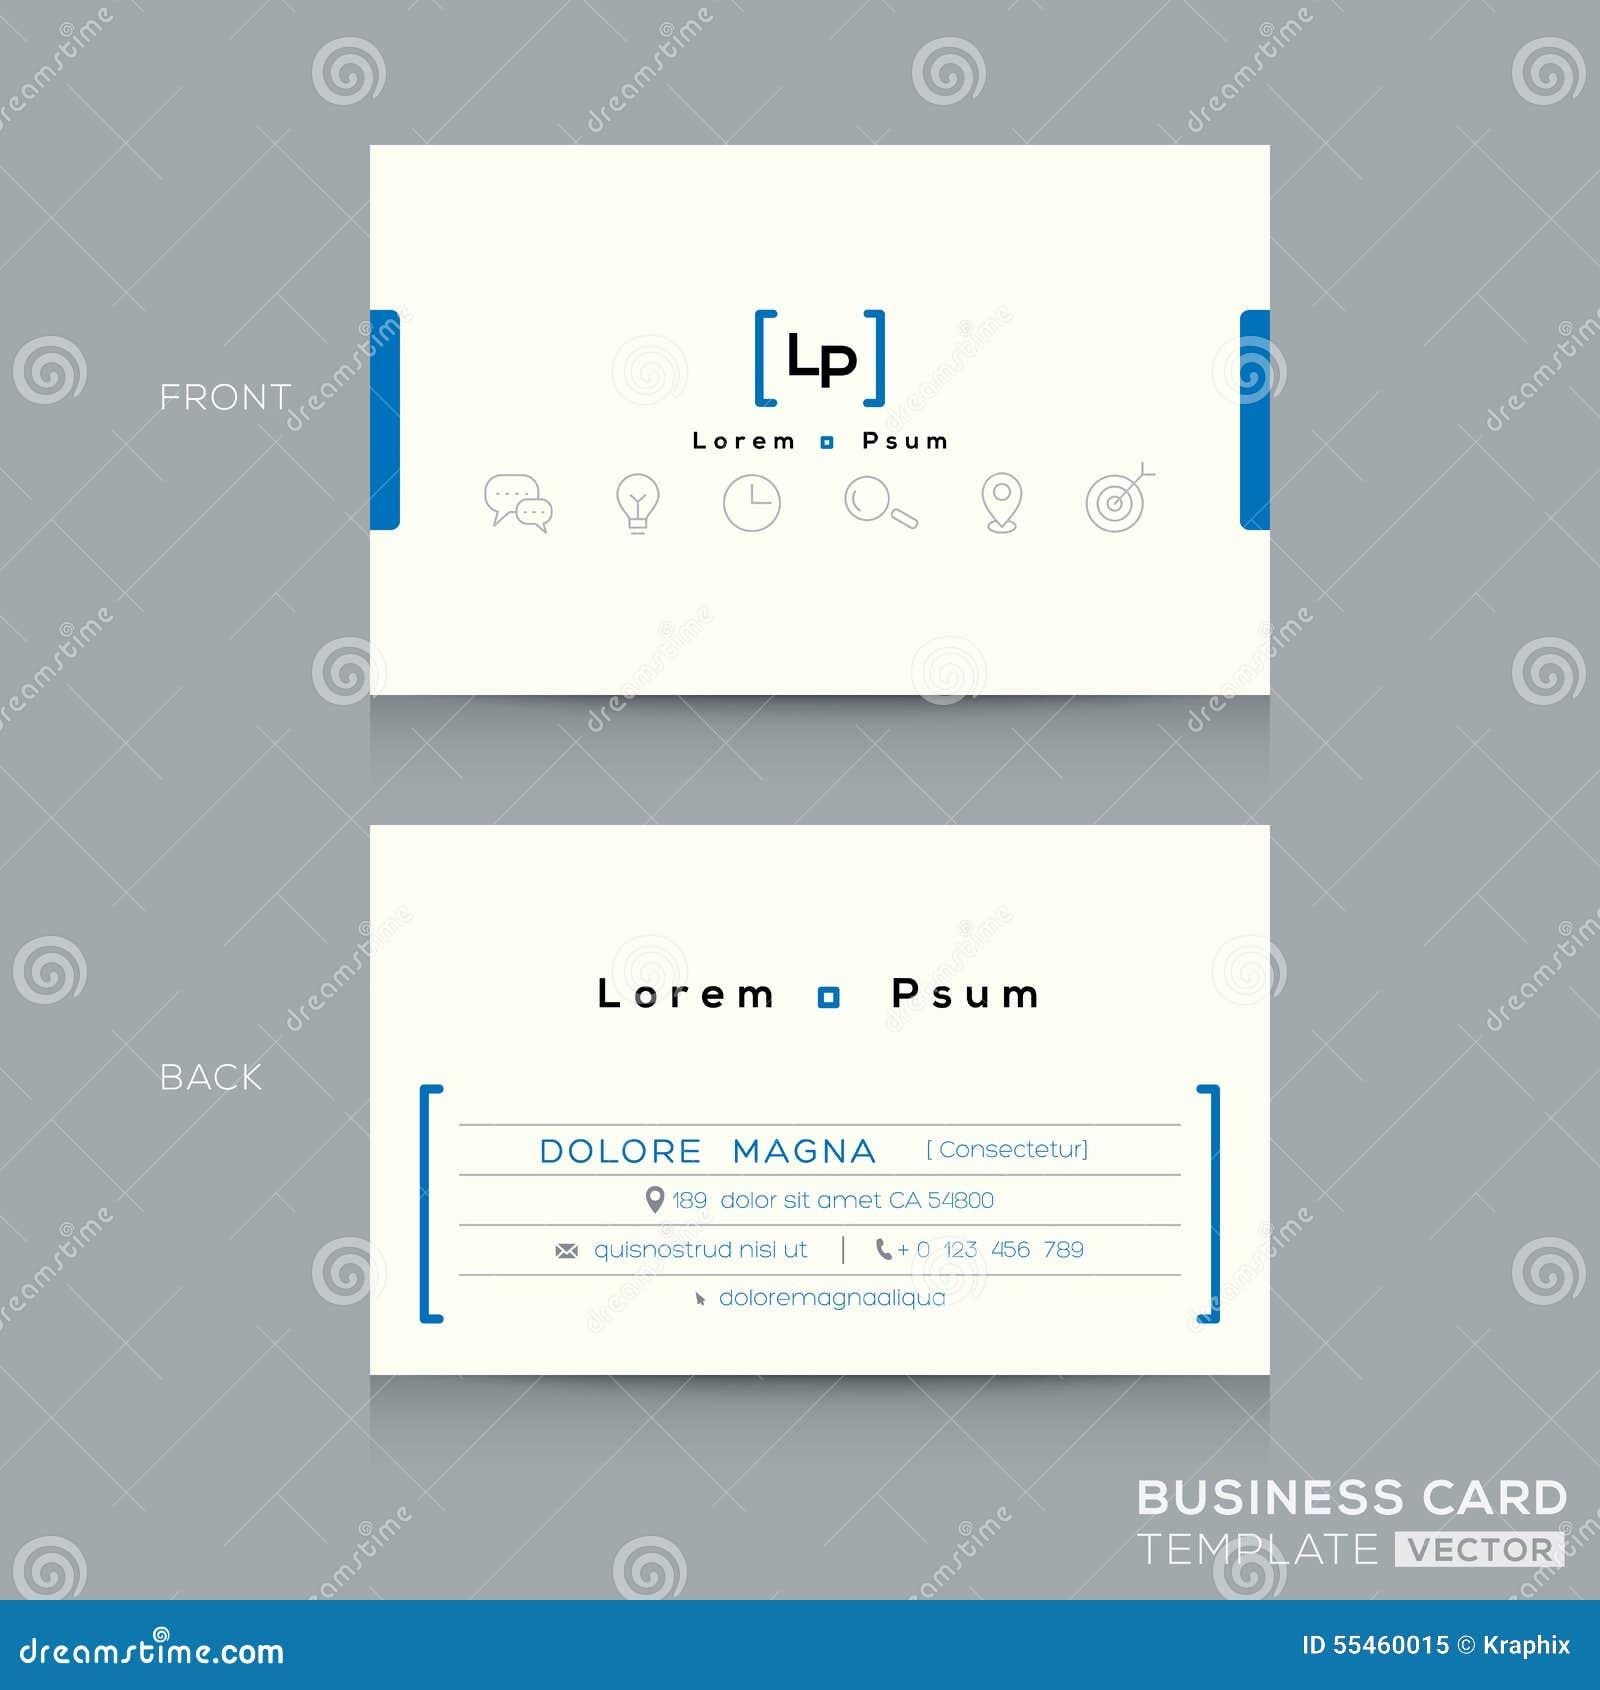 Minimal clean design business card template stock vector for The office business card template